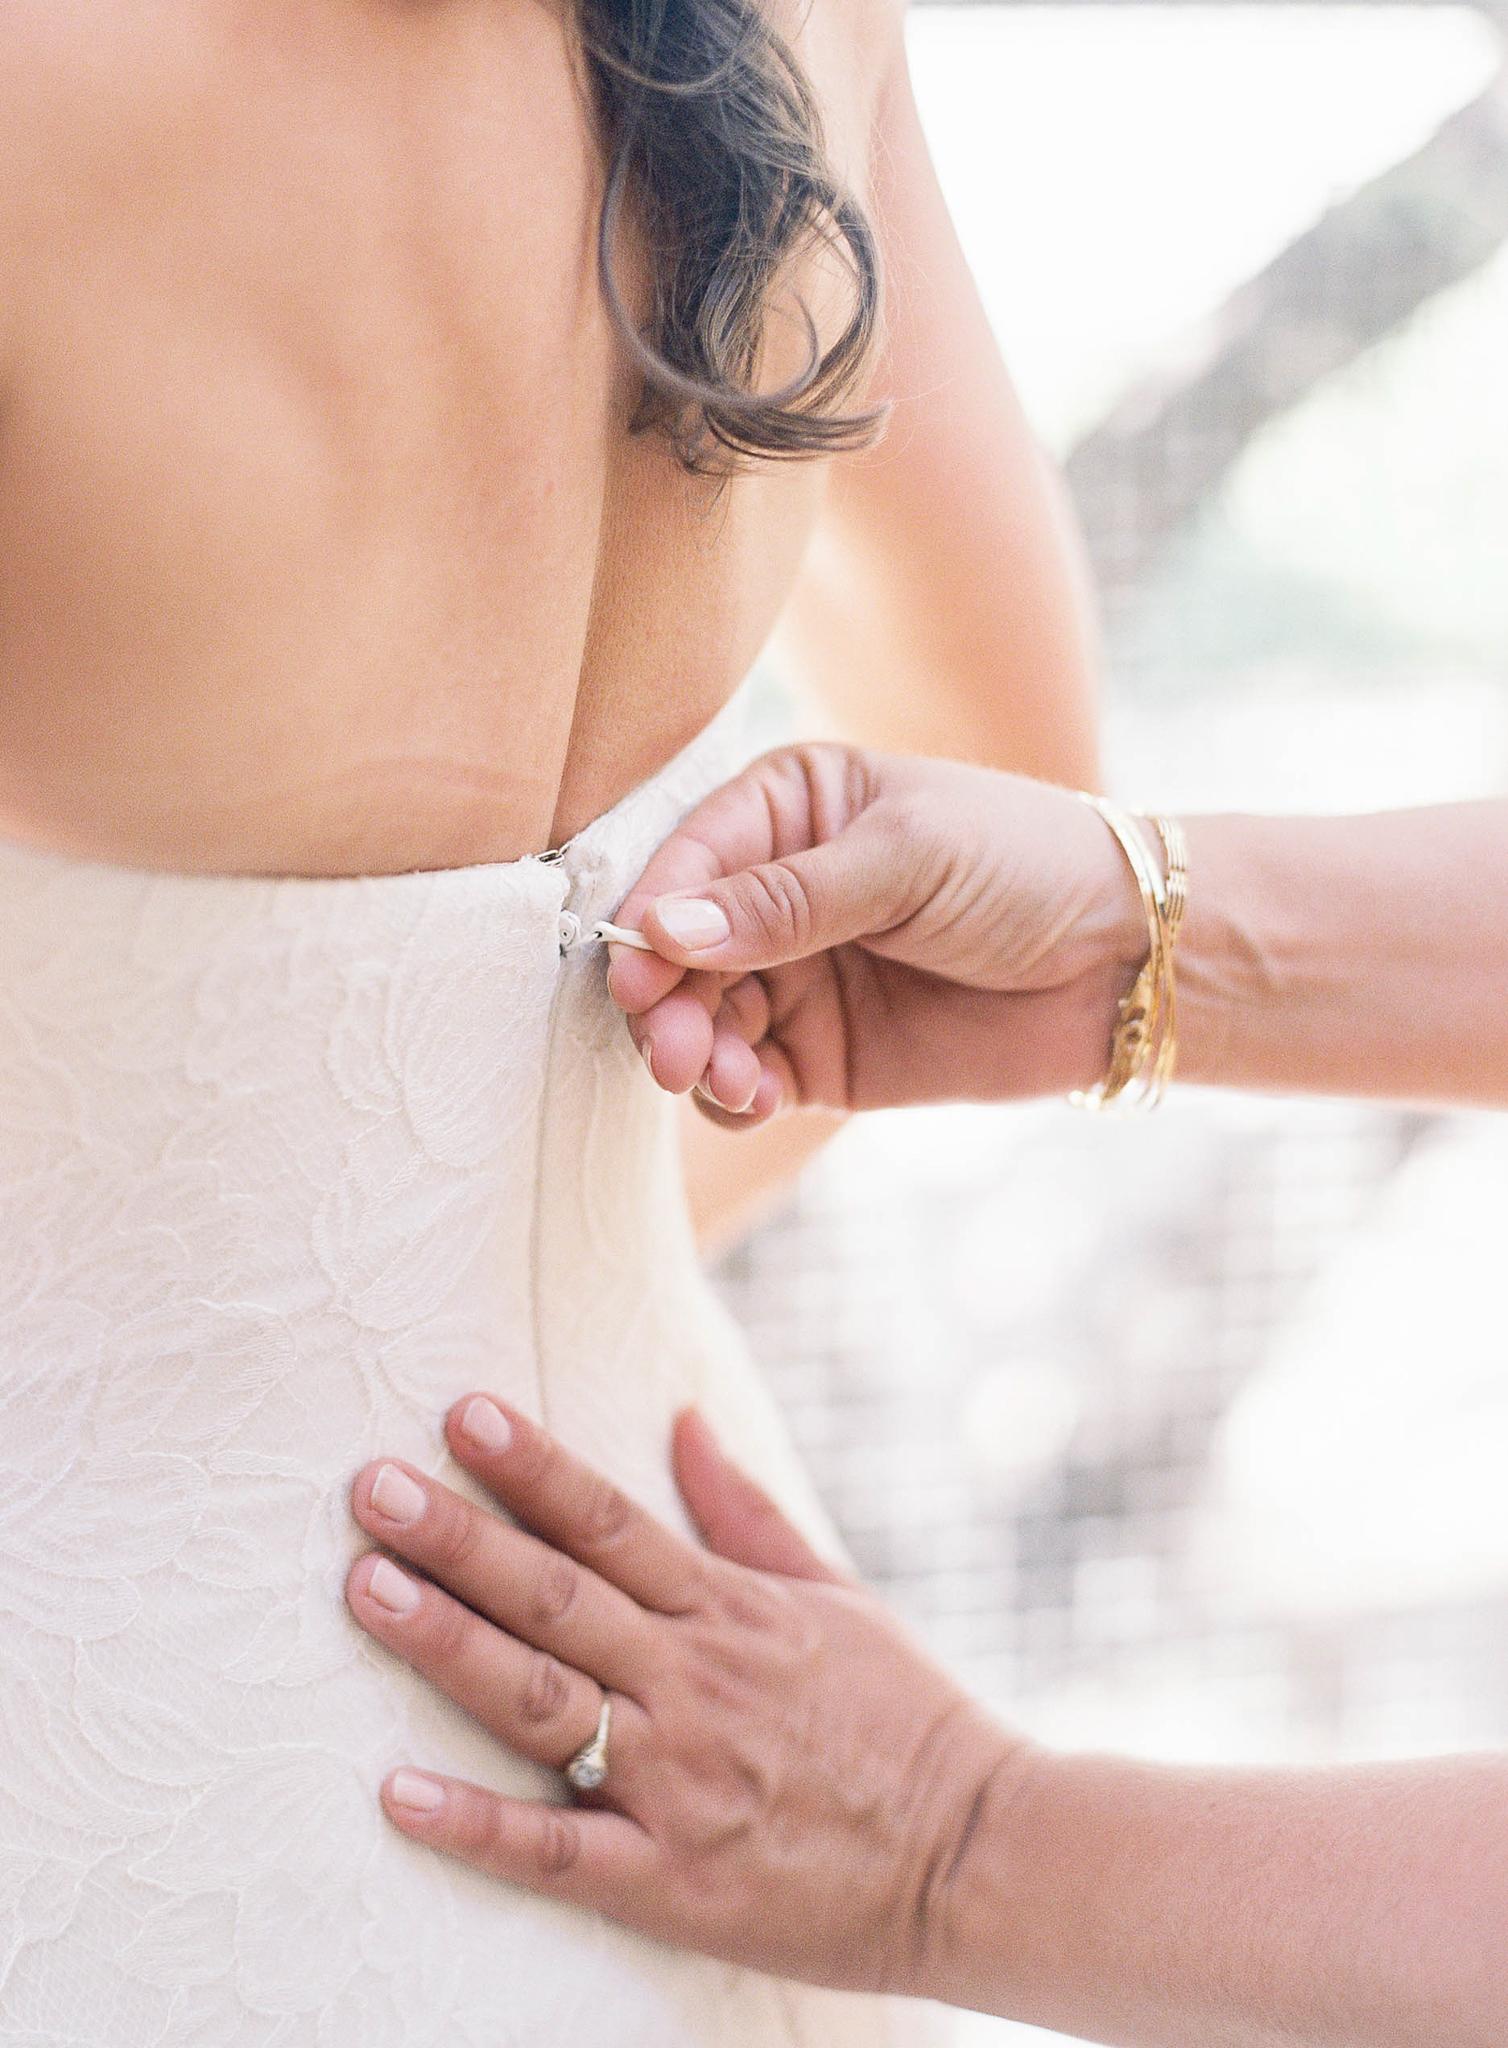 Meghan Mehan Photography - Fine Art Film Wedding Photography - San Francisco   Napa   Sonoma   Big Sur   Chicago   Minneapolis   Milwaukee   Lake Geneva   Door County   Wisconsin 006.jpg